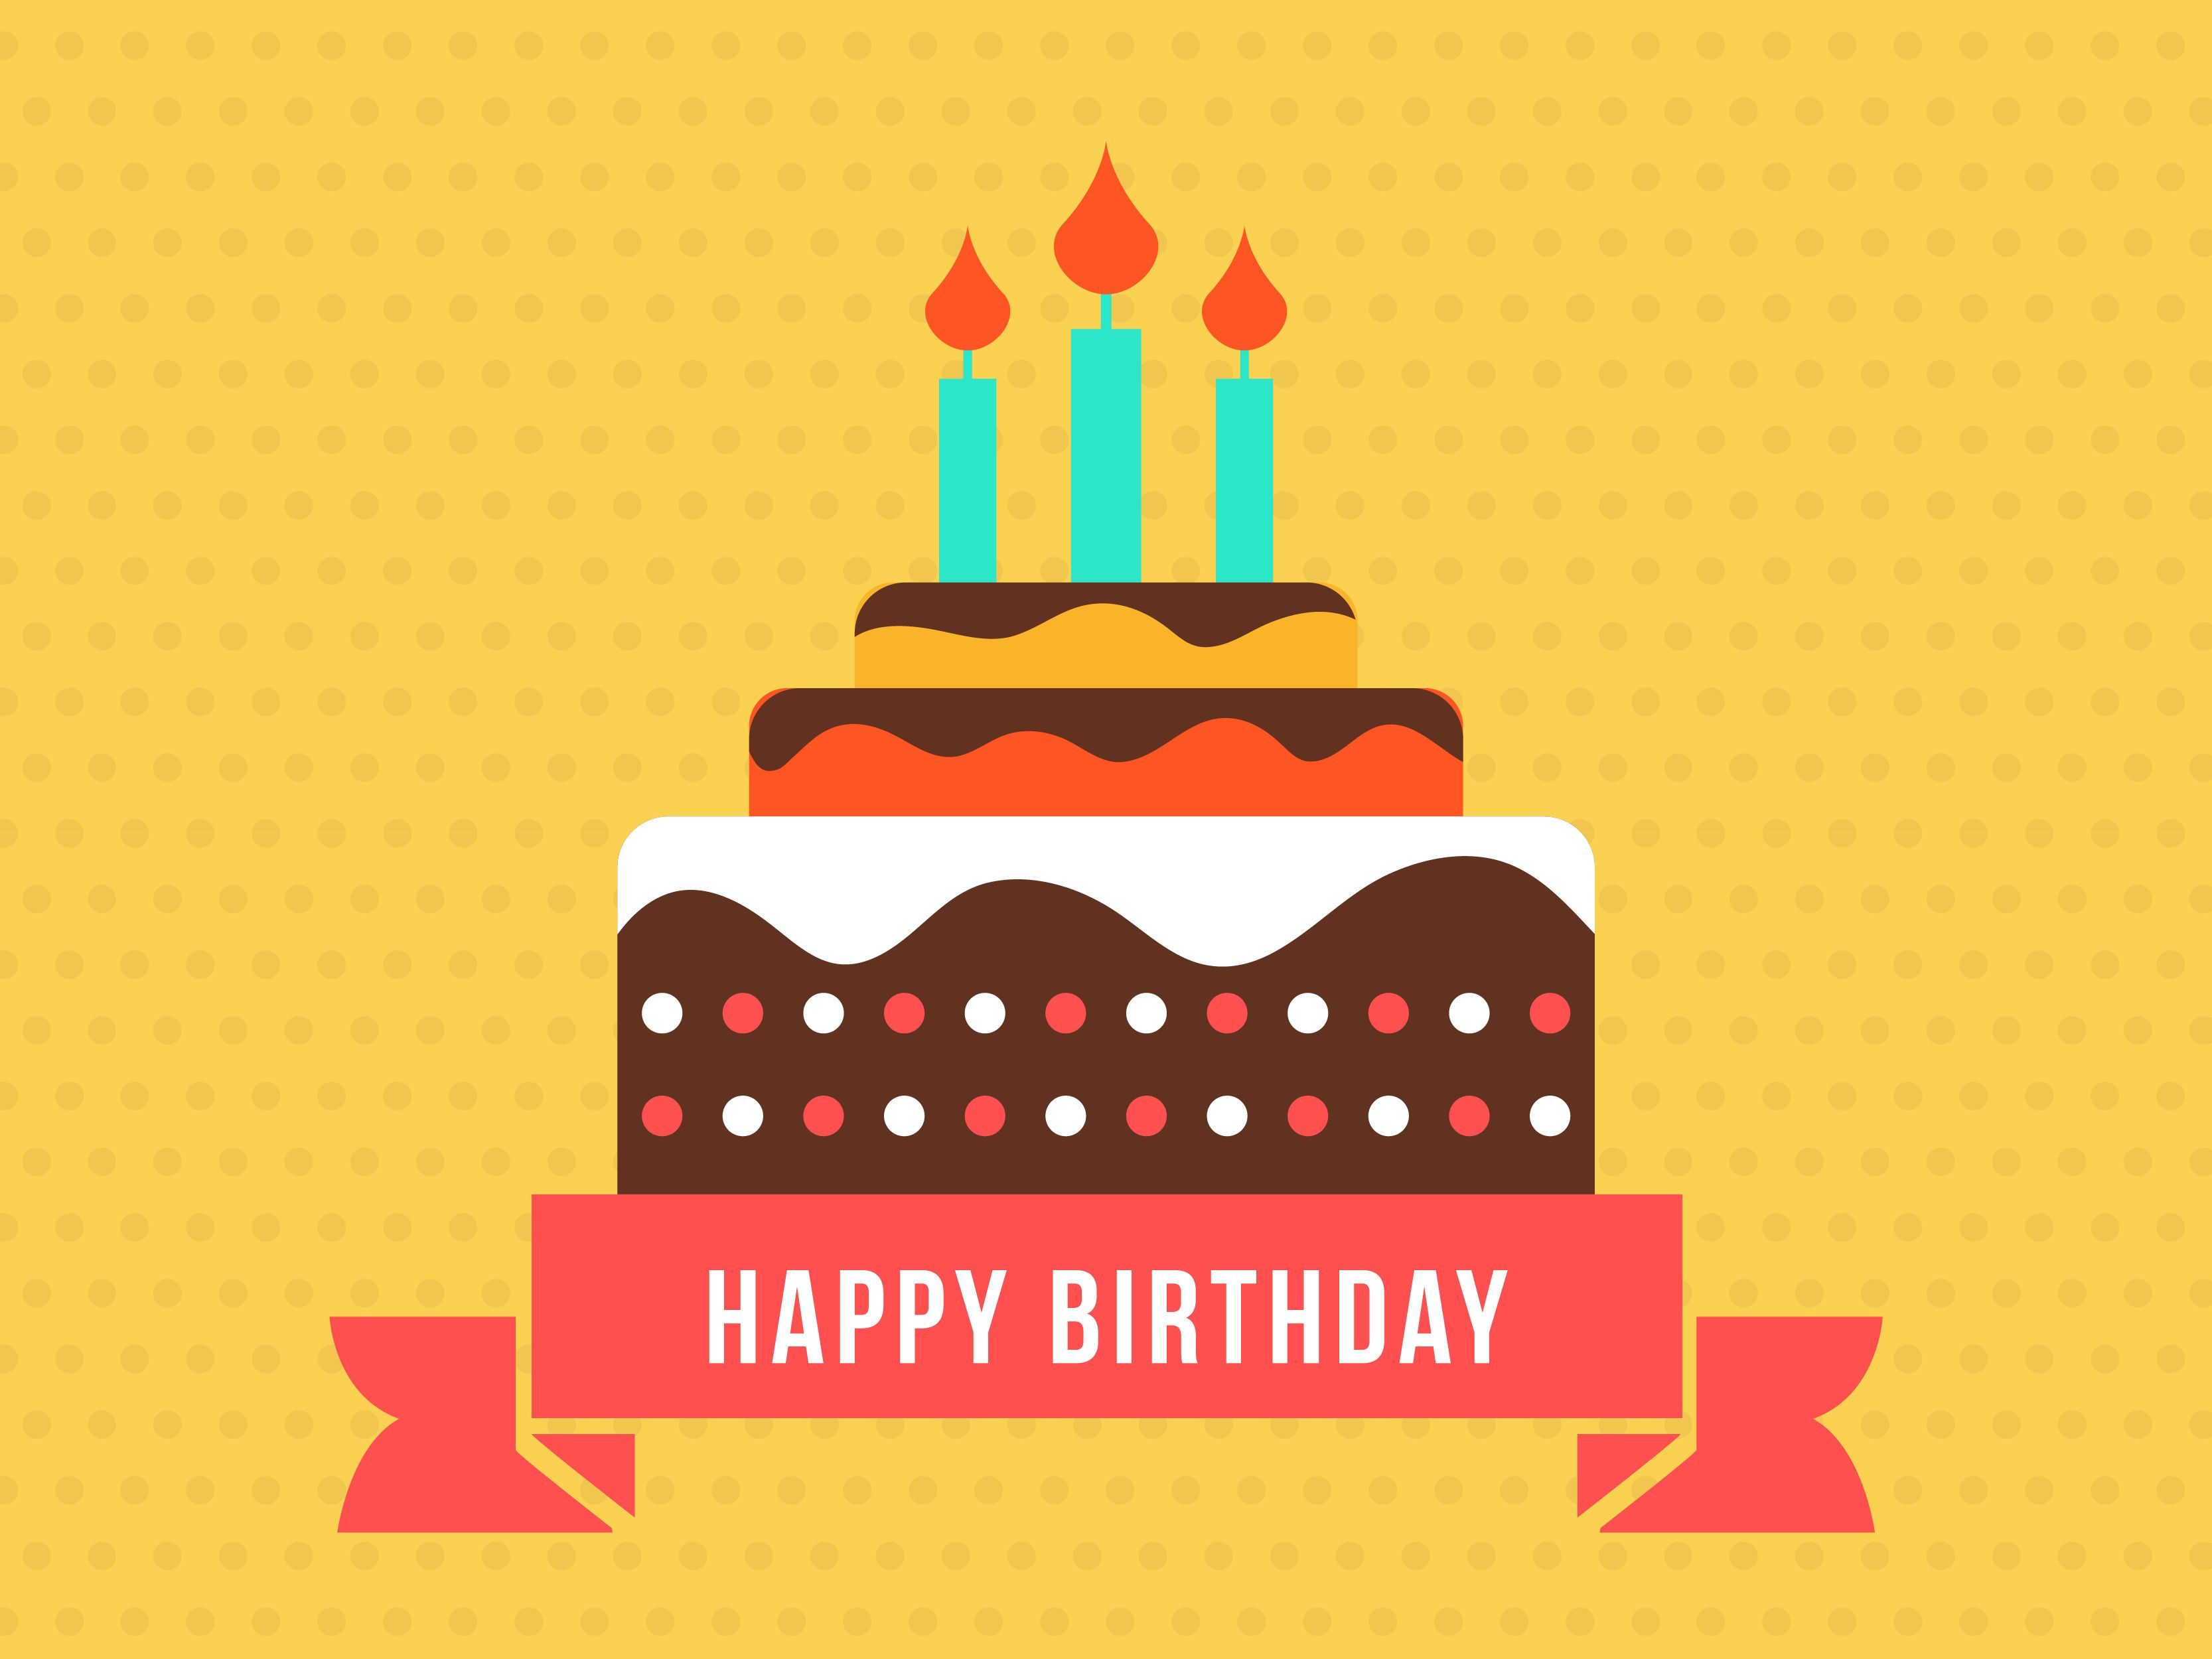 Happy birthday Vector & Graphics to Download